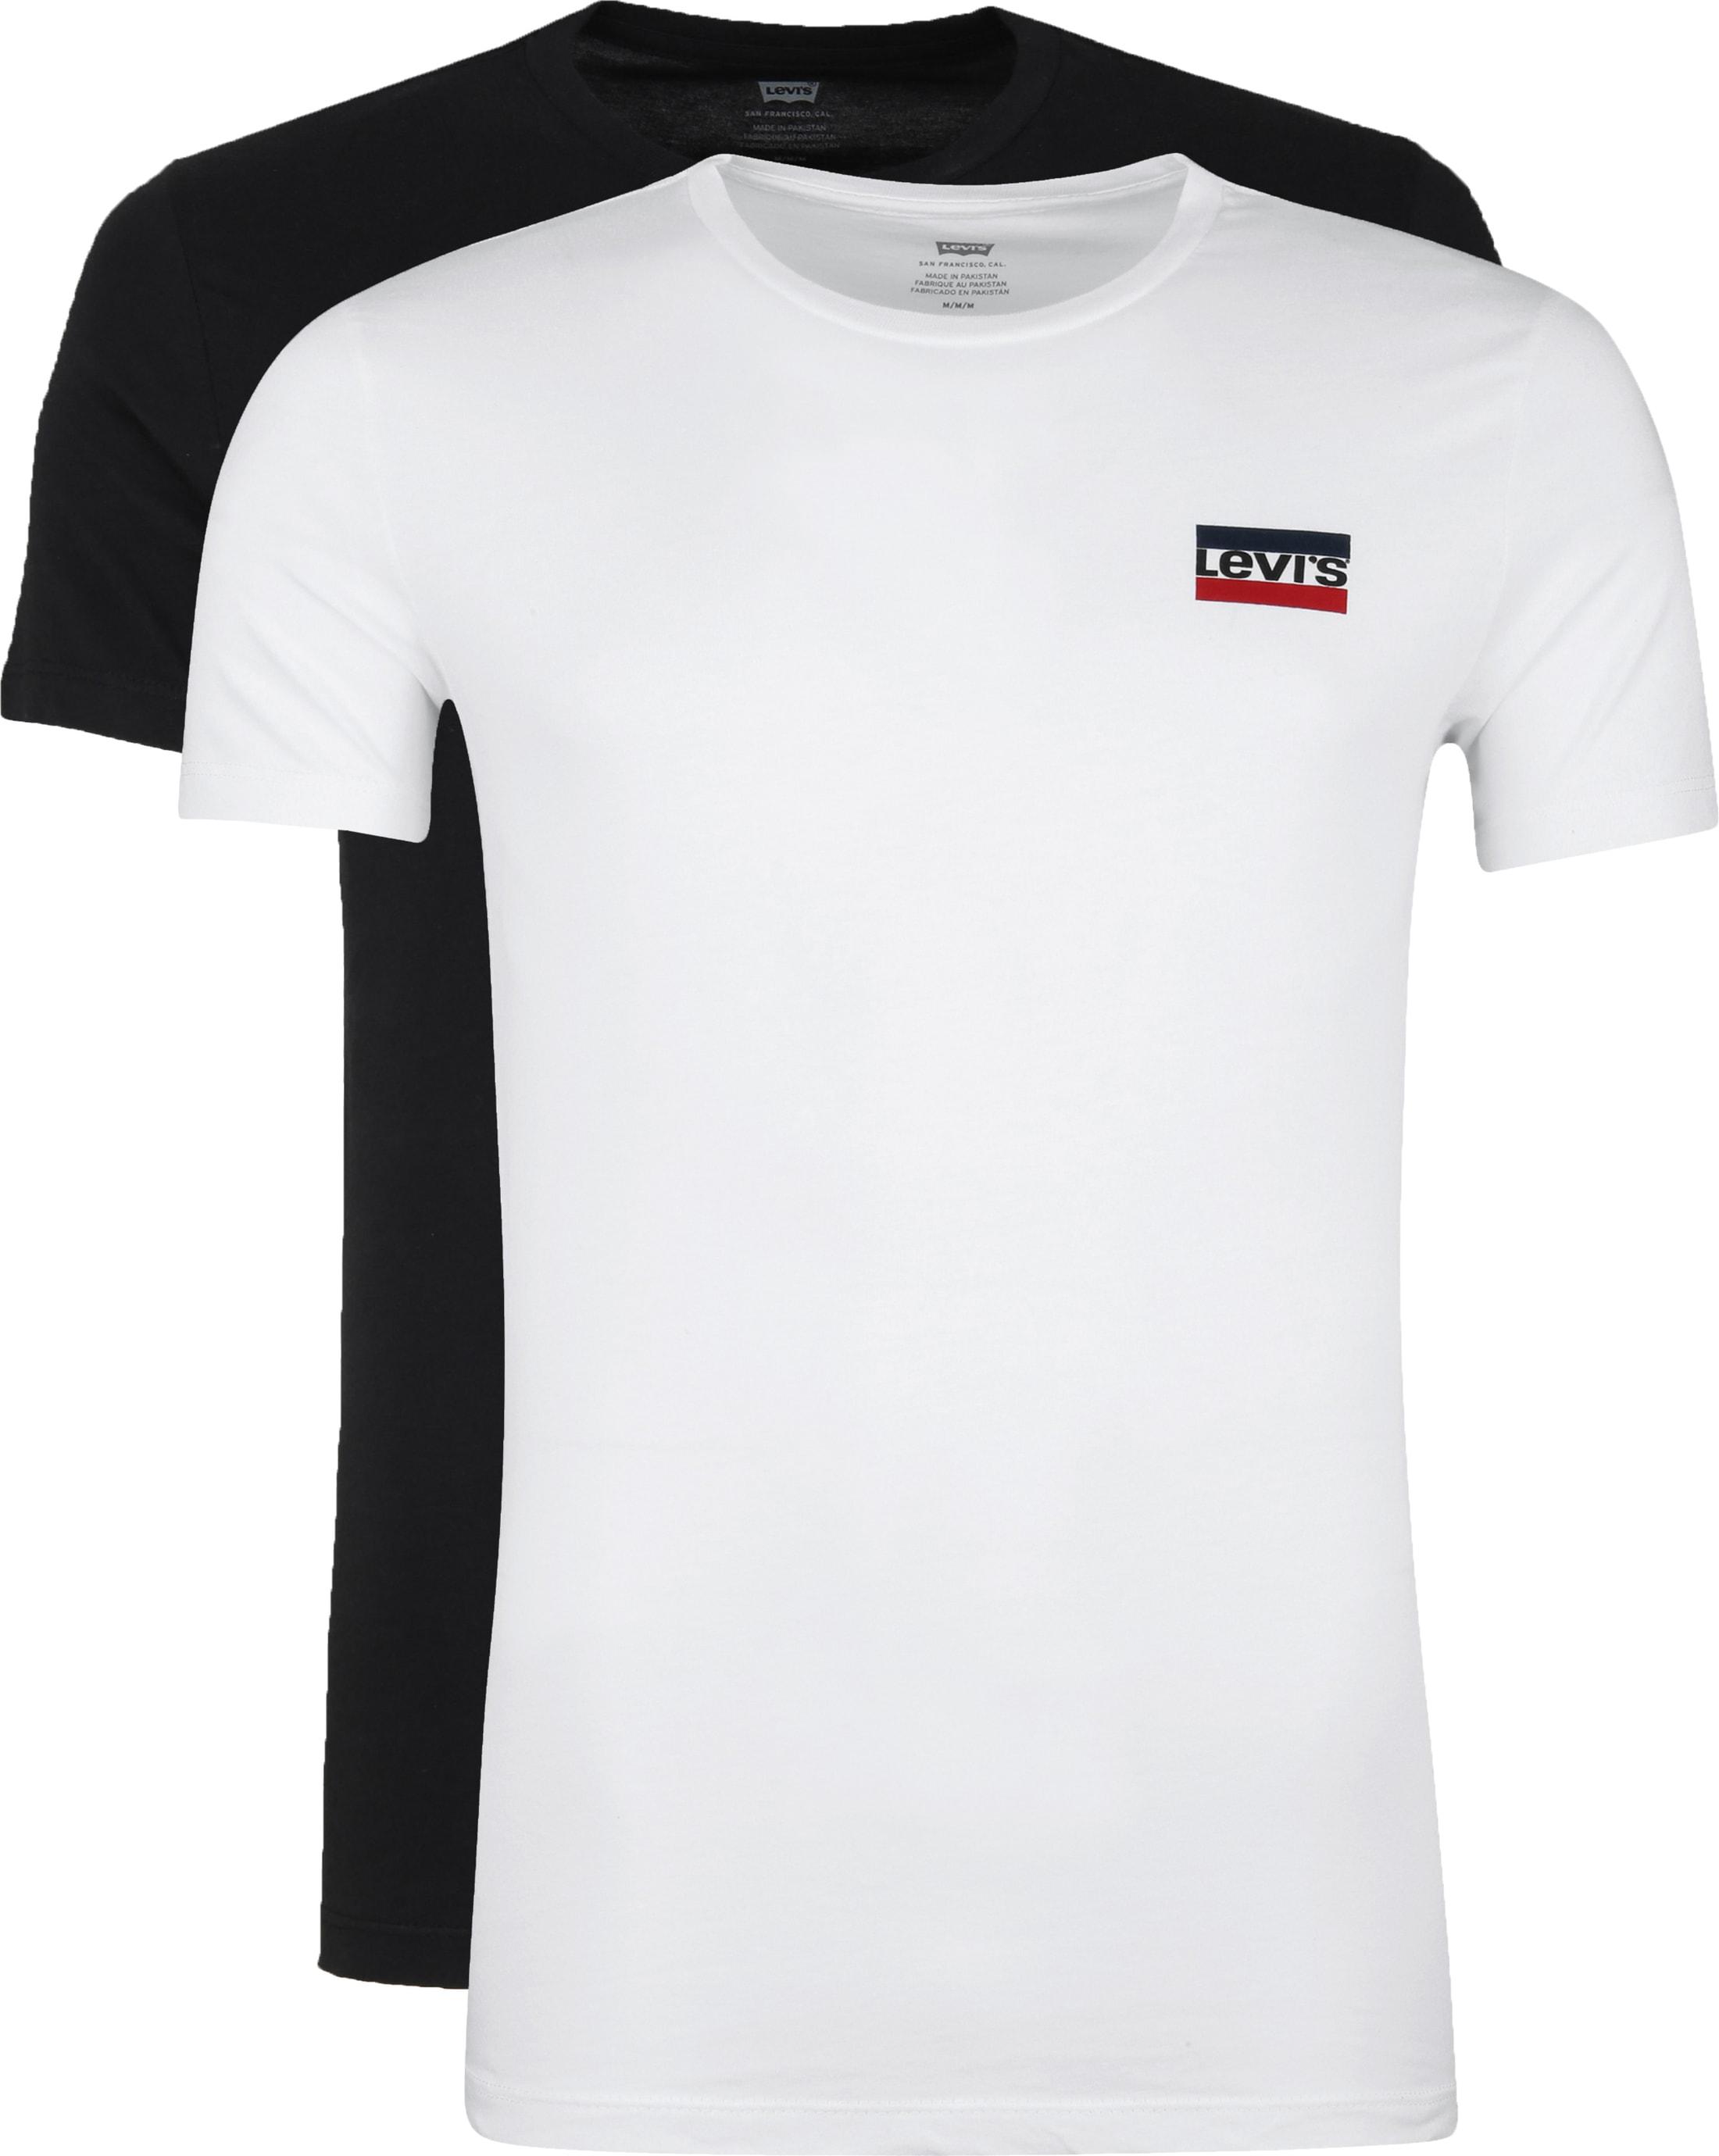 Levi's T-shirt O-Neck 2Pack photo 0